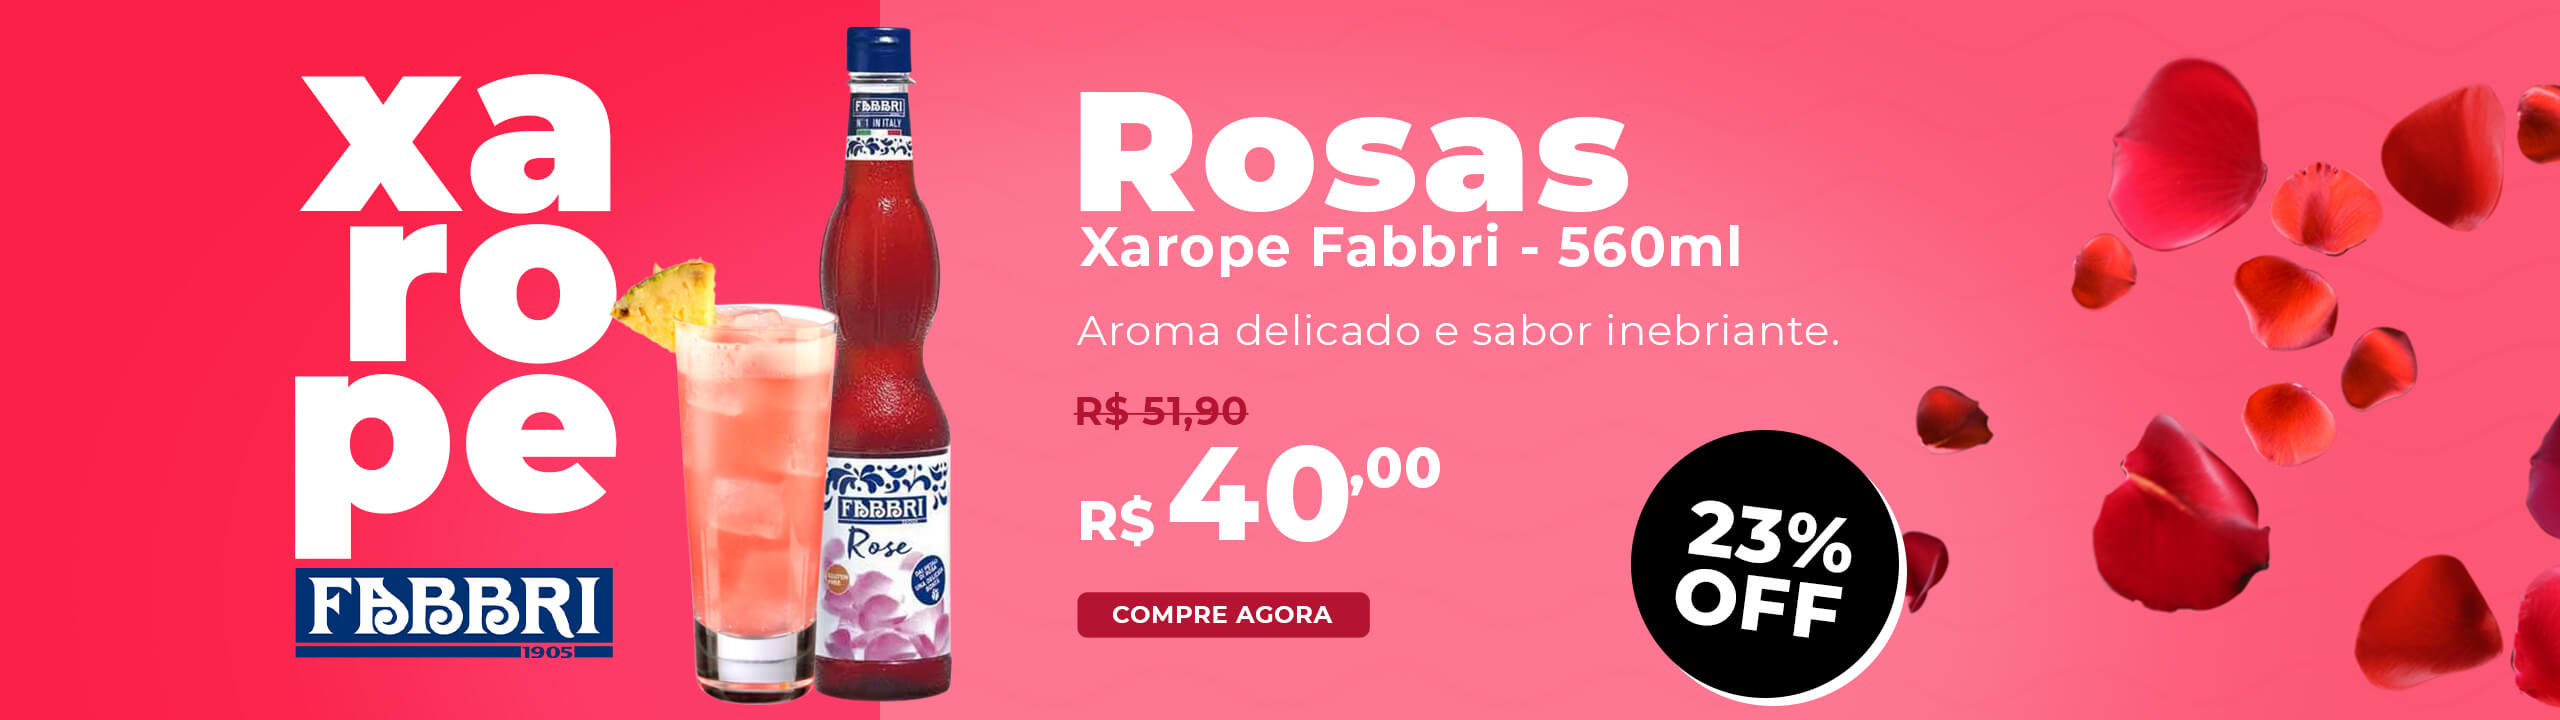 Xarope Rose Rosa Fabbri Profissional 560ml